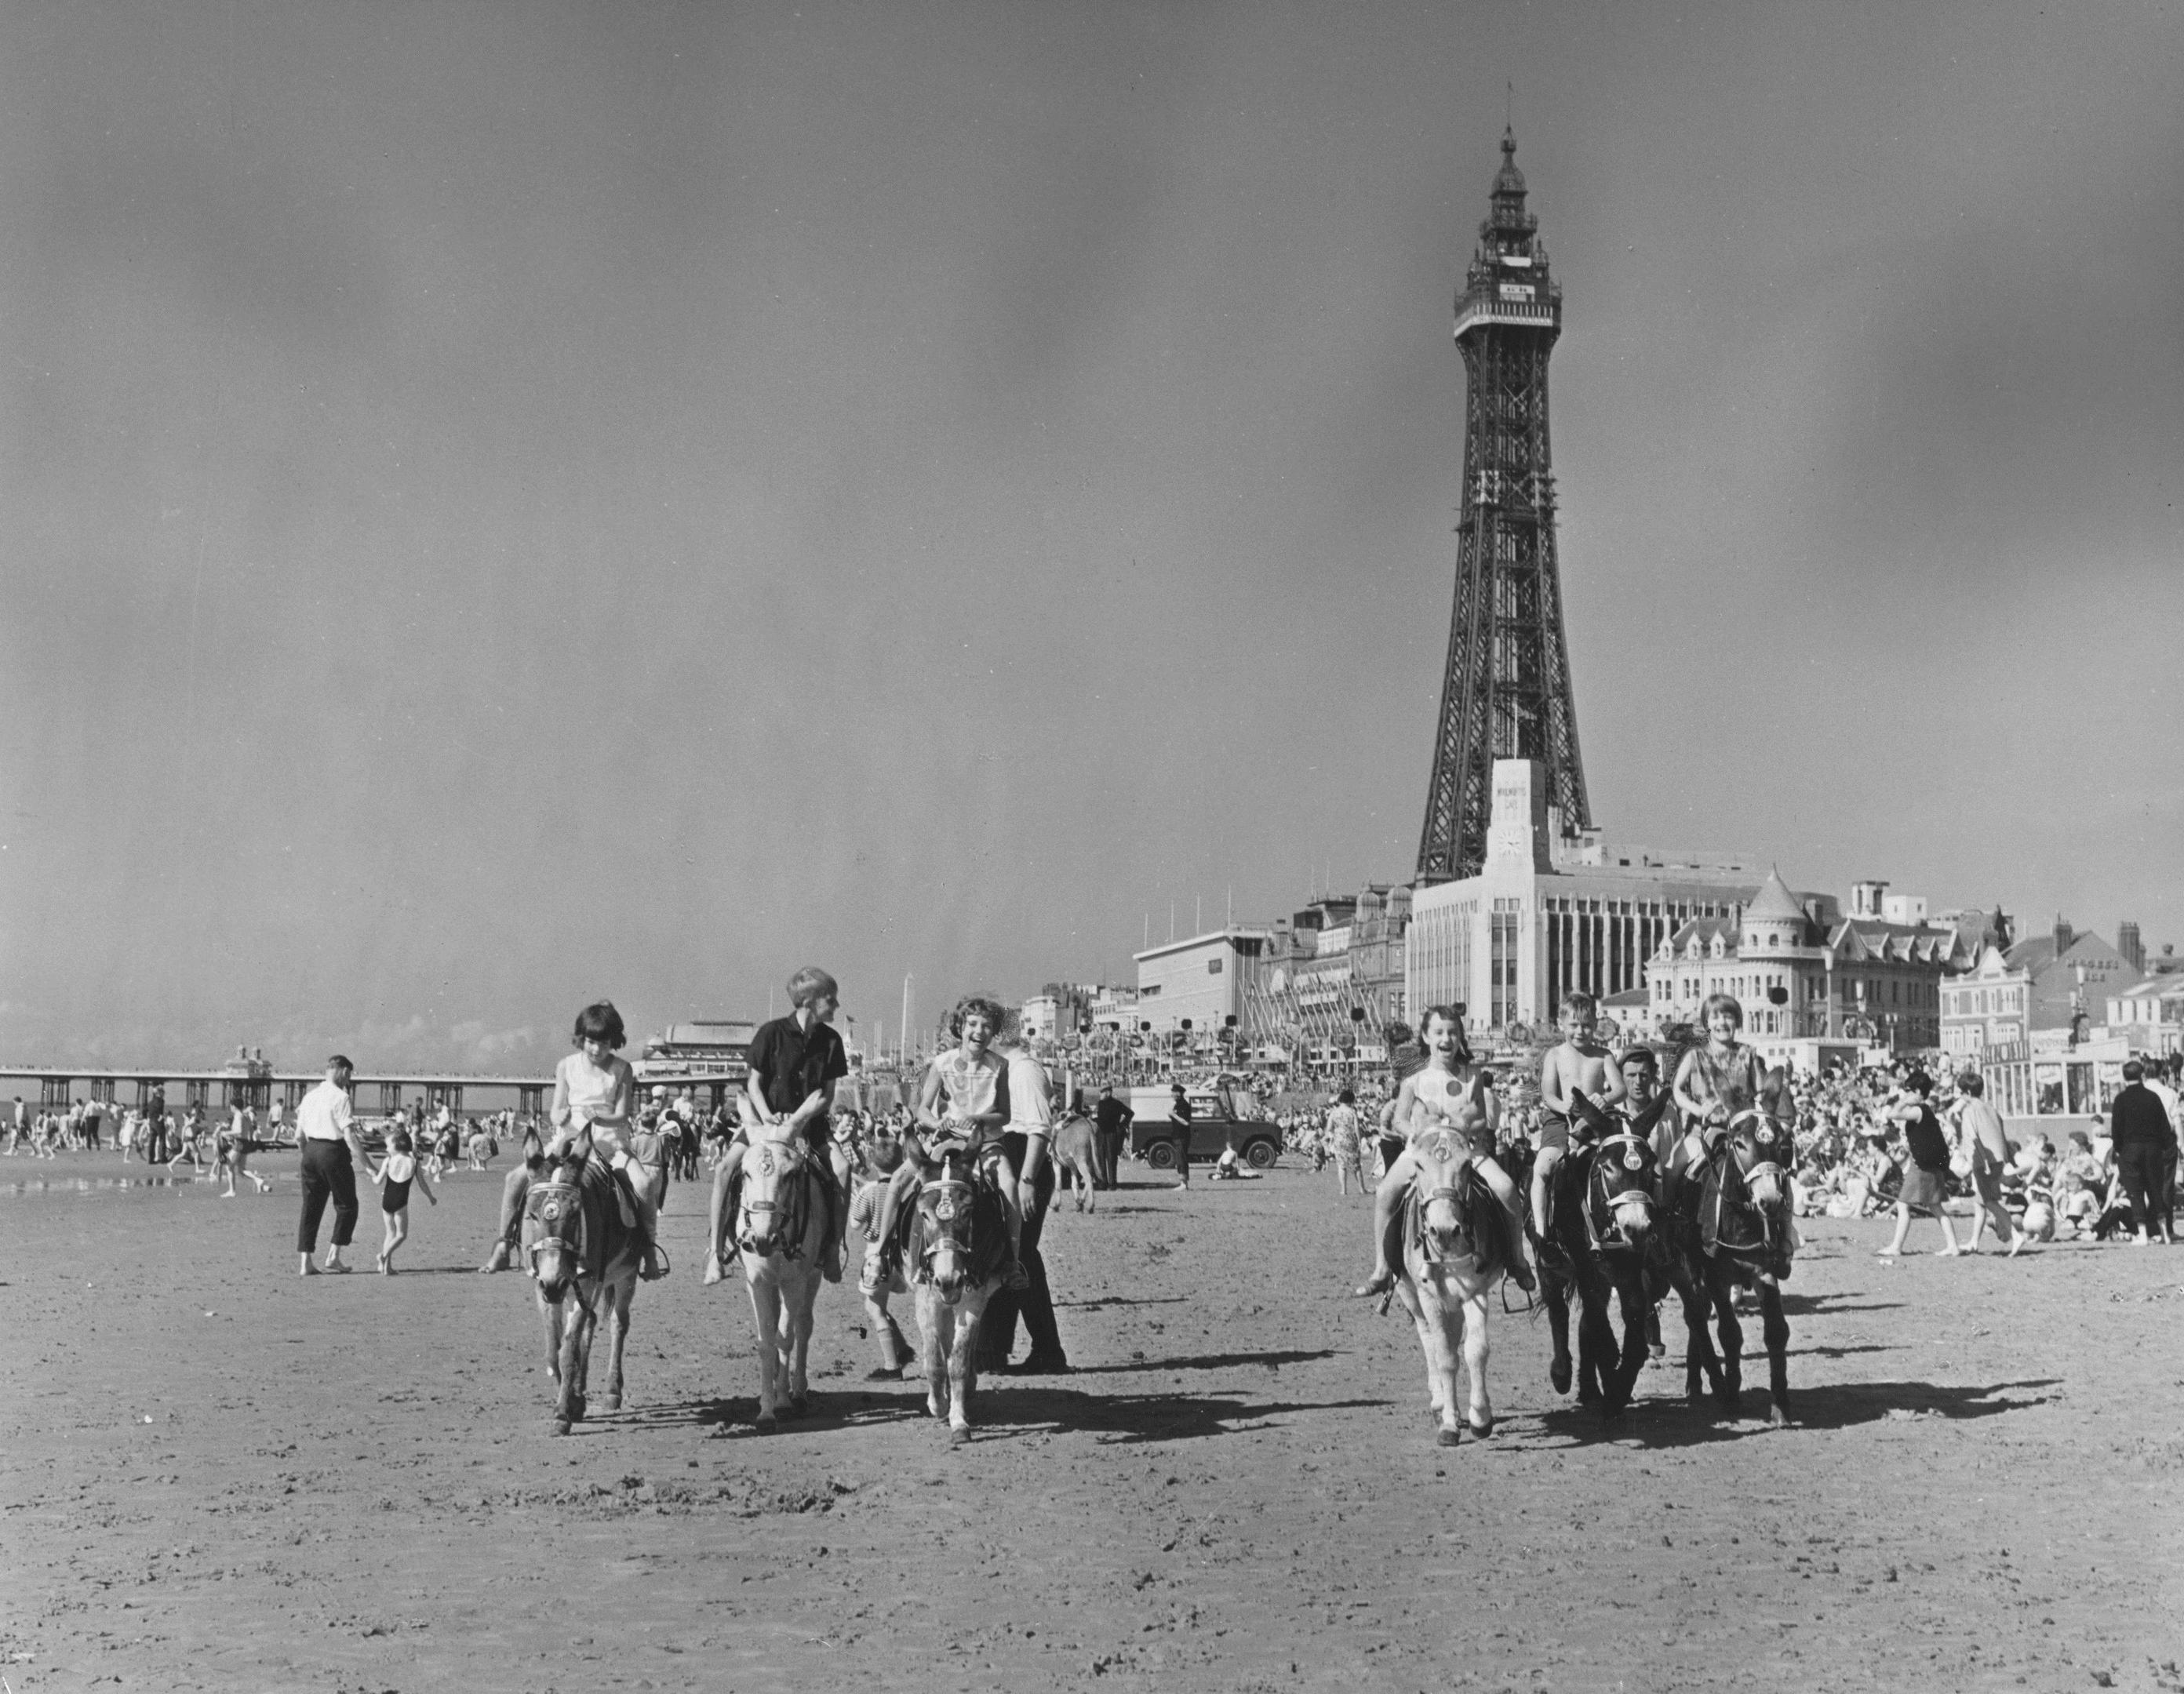 A busy Blackpool beach, 1965 (George Freston/Fox Photos/Getty Images)